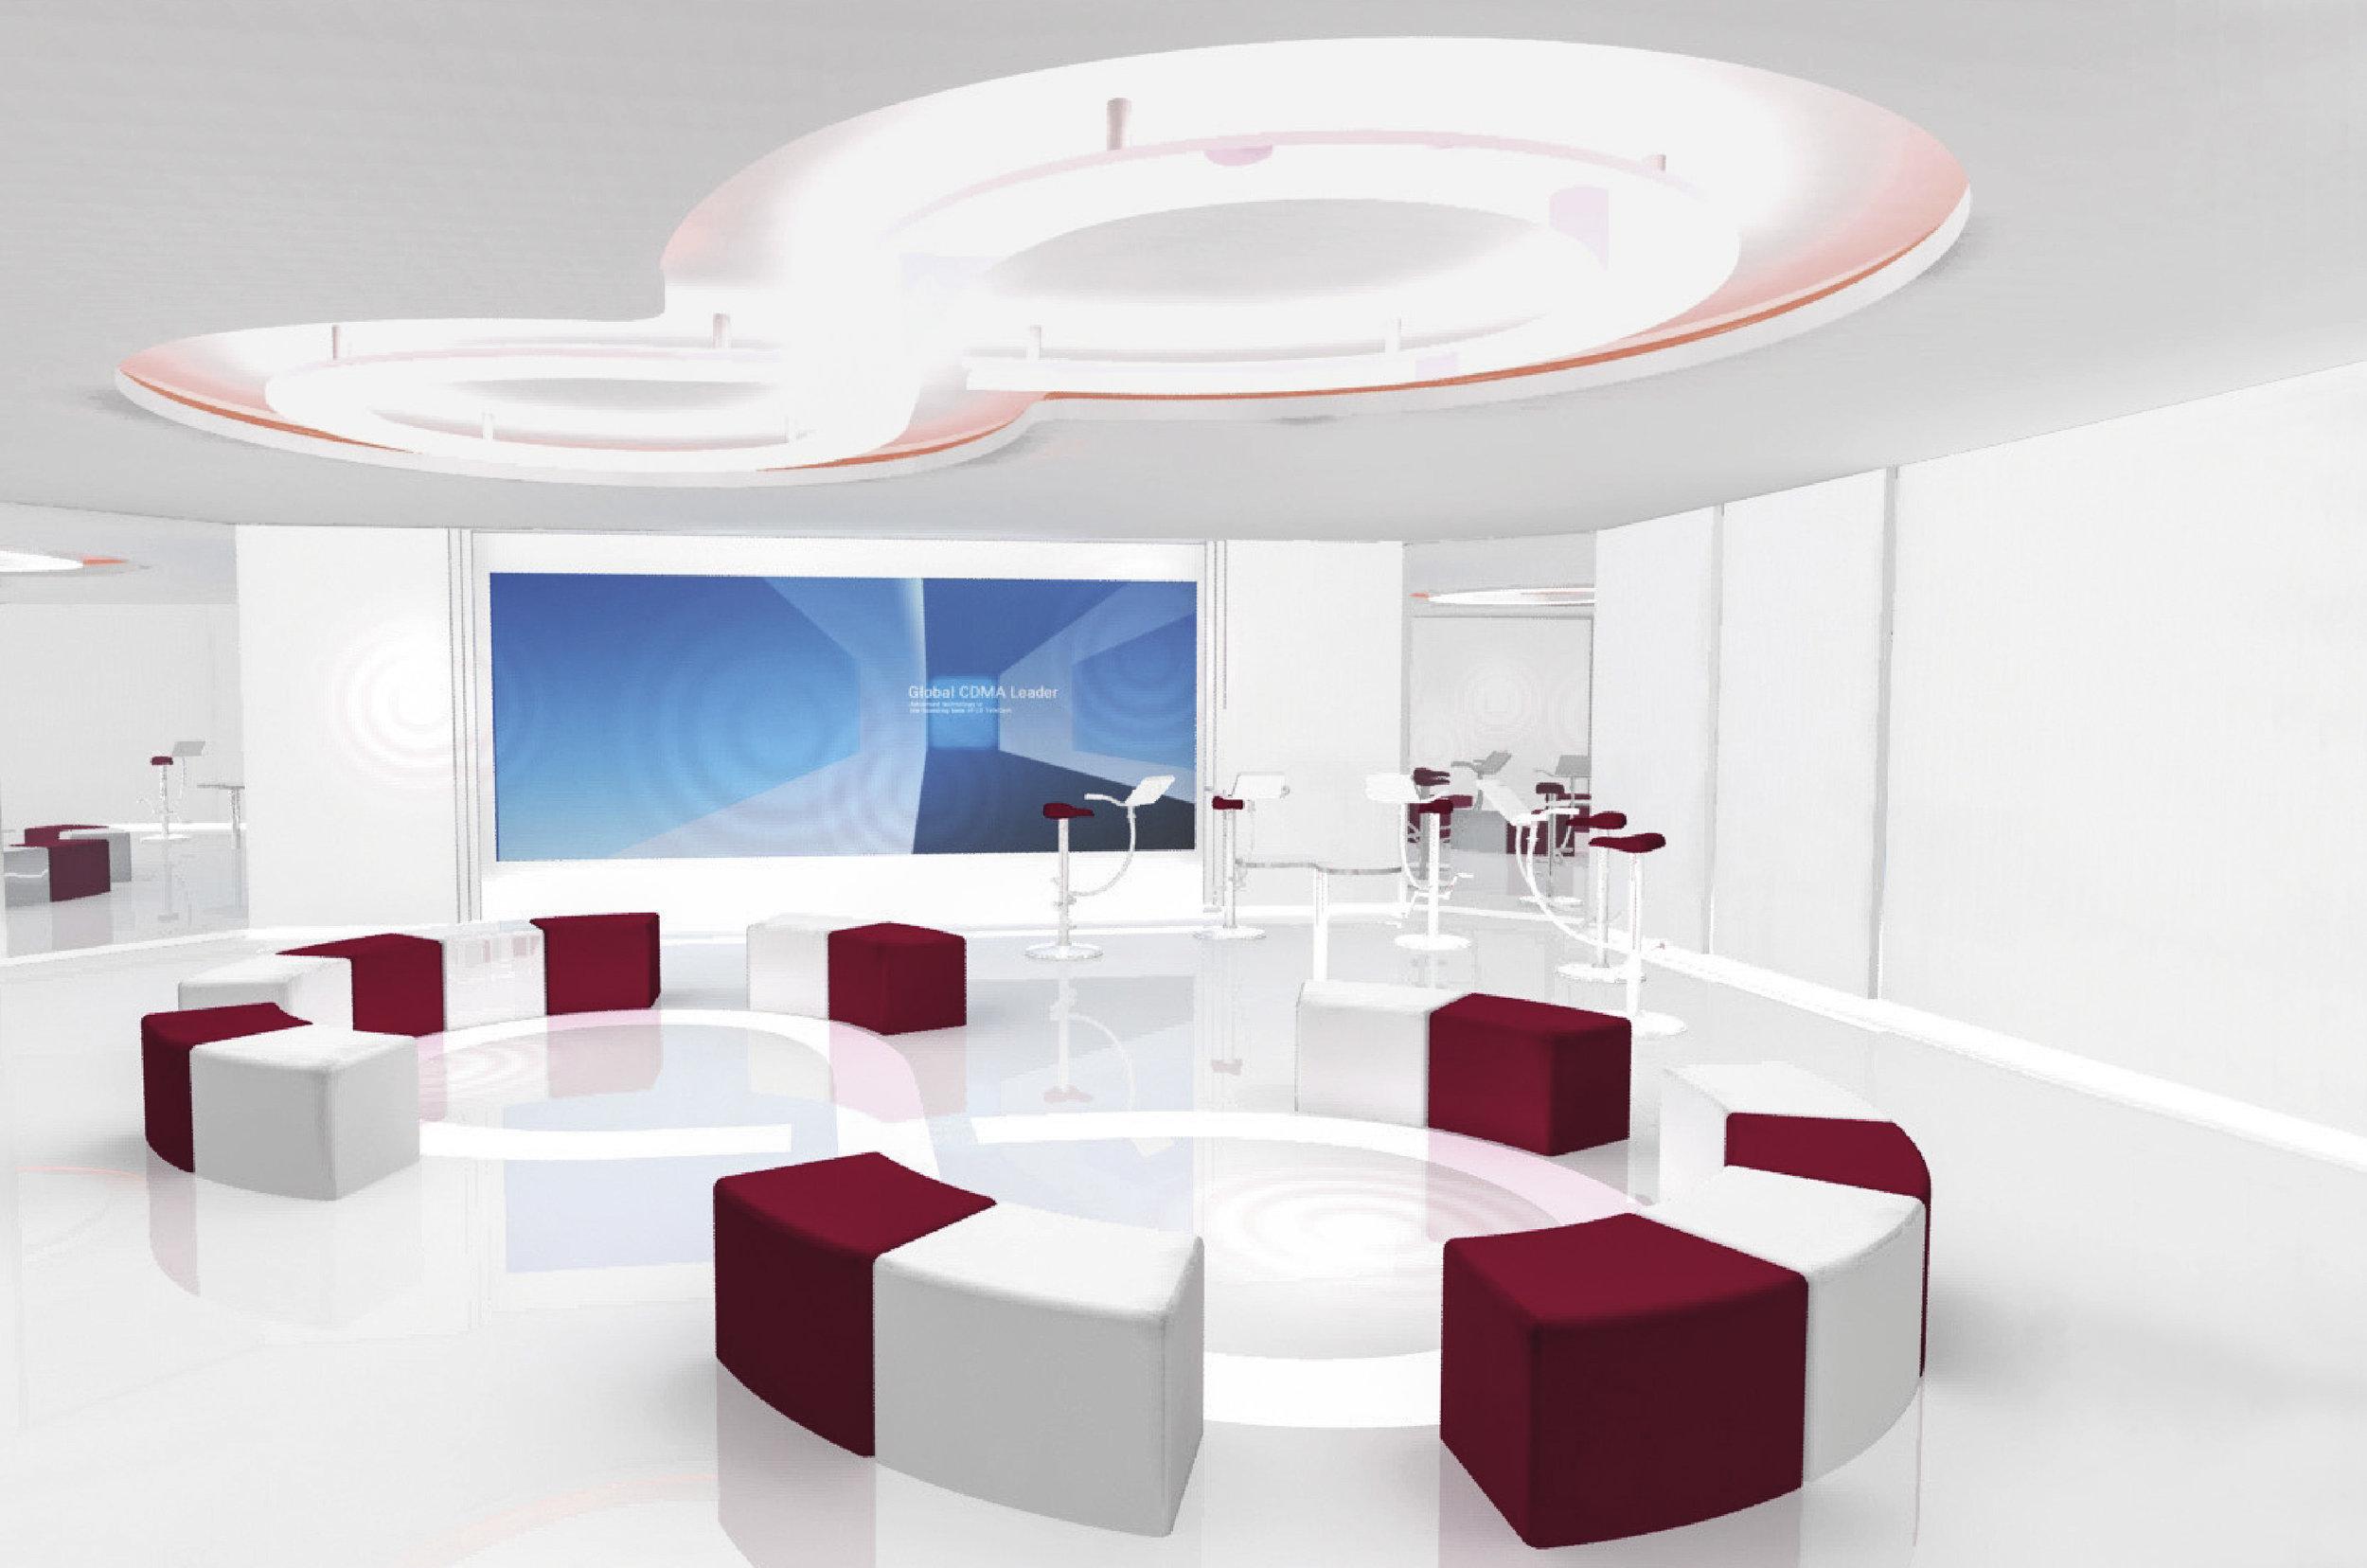 LG Innovation Space (Ananta)_Branded Spaces_Elephant Design_2.jpg